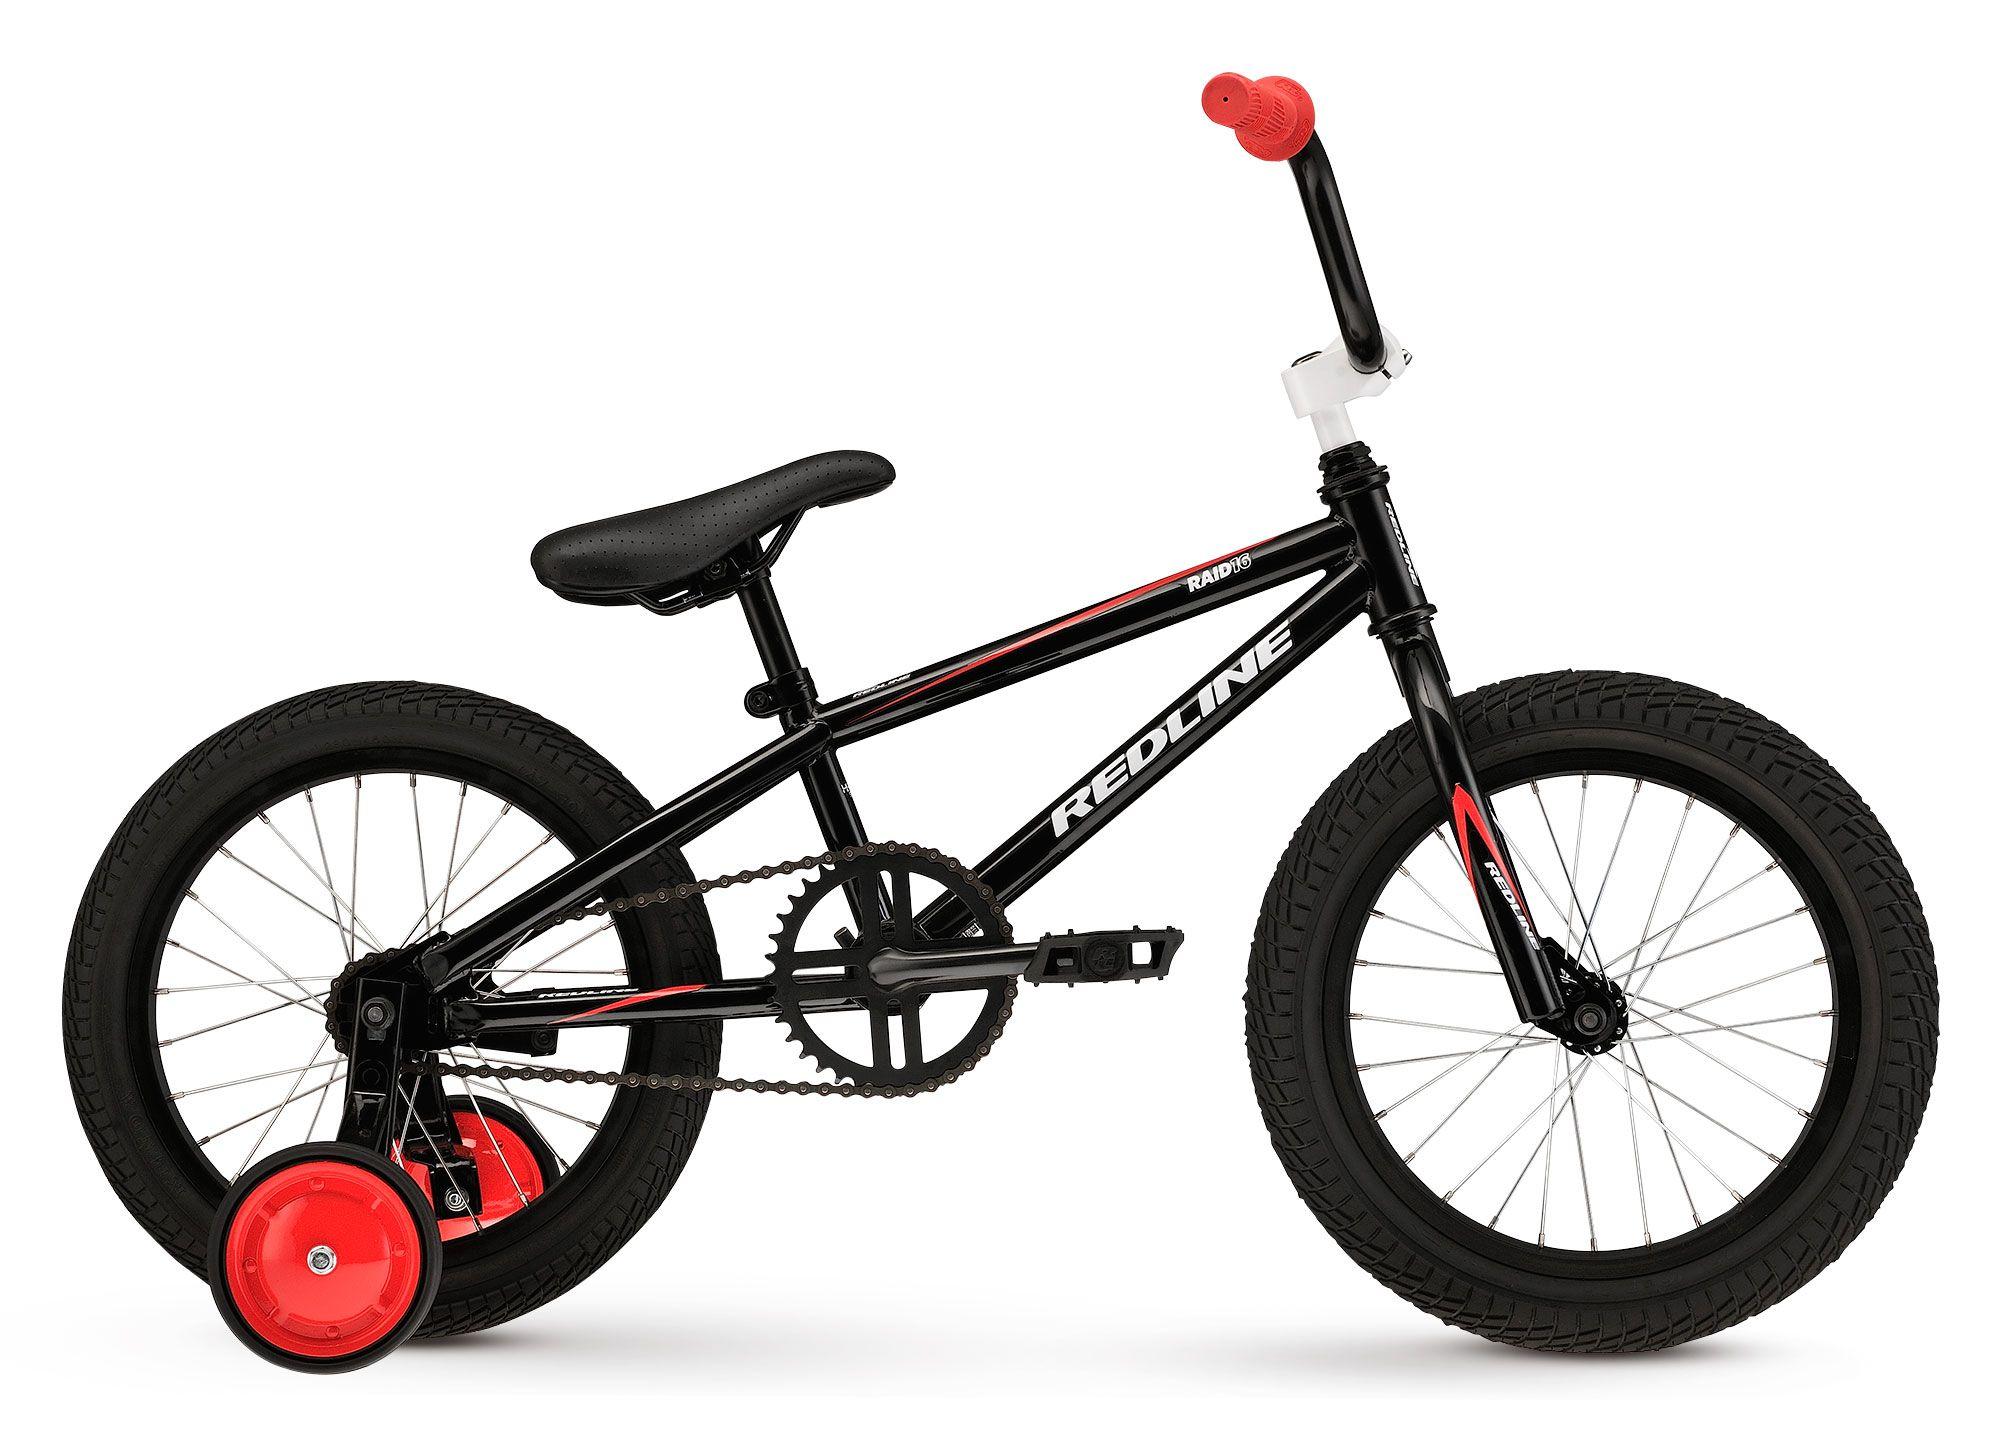 2014 raid 16 redline bicycles black bmx bicycle